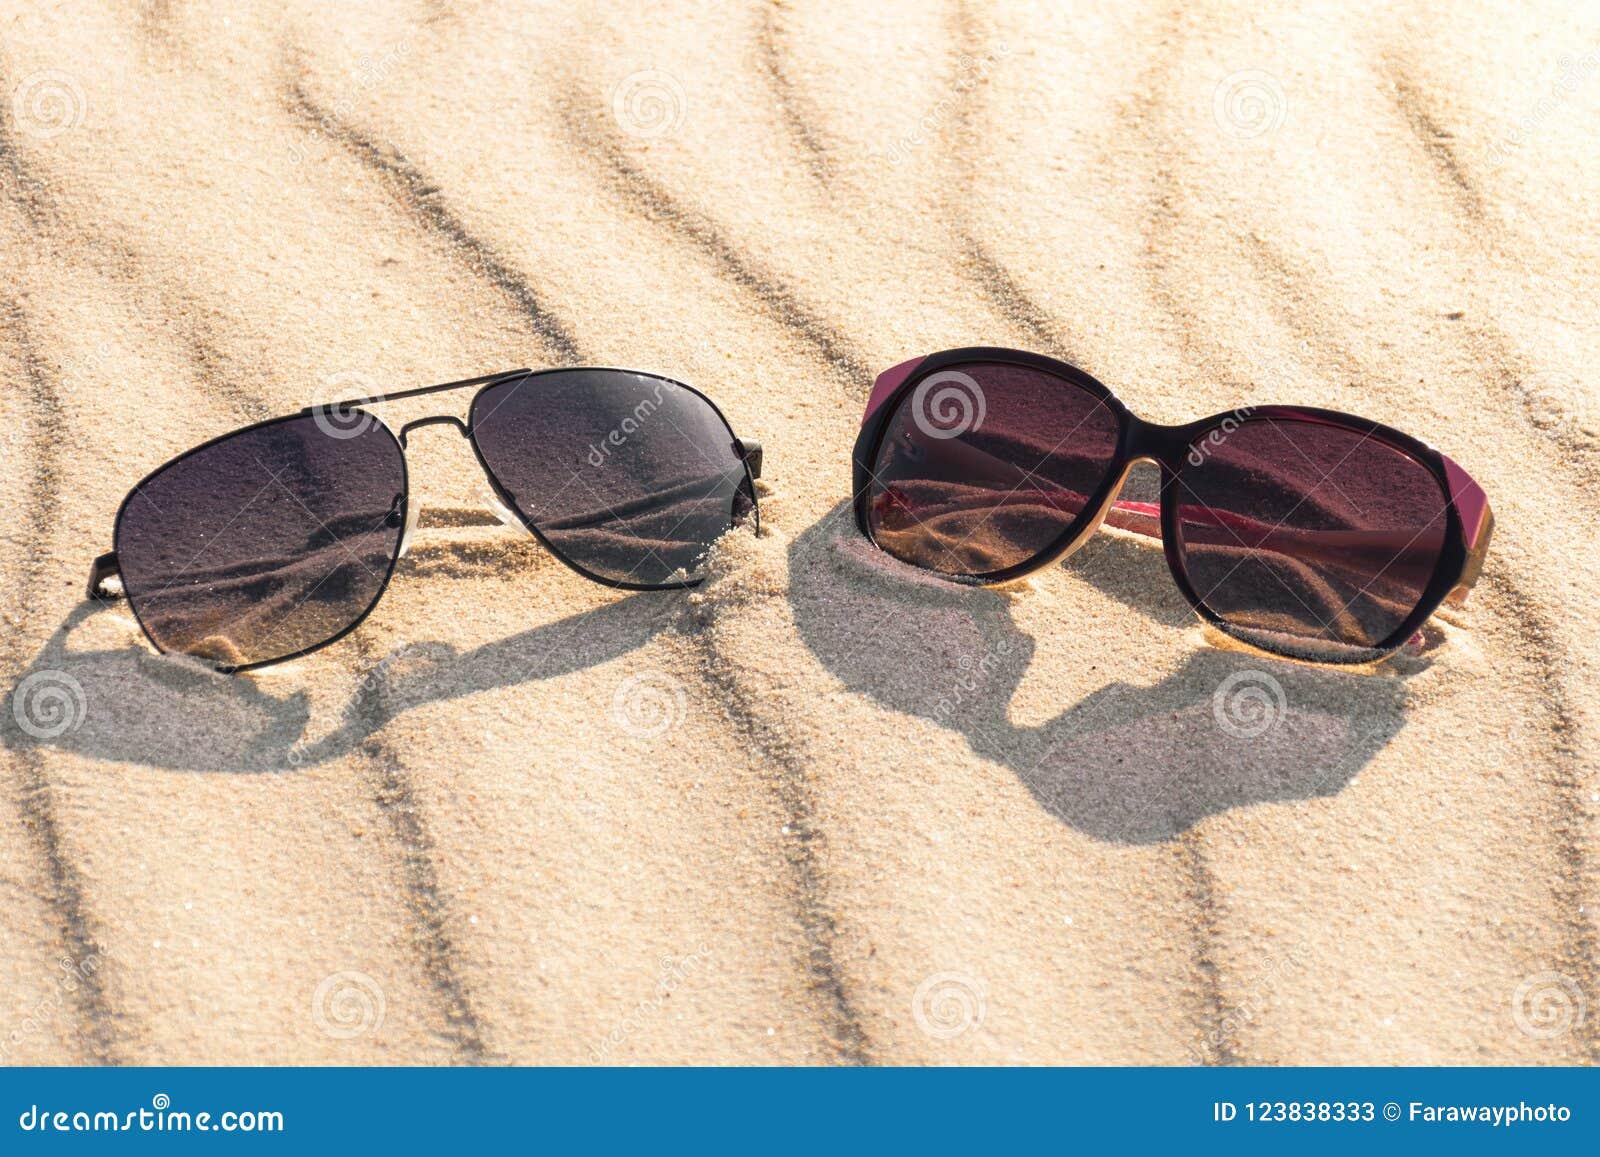 Male and female glasses on sandy beach.